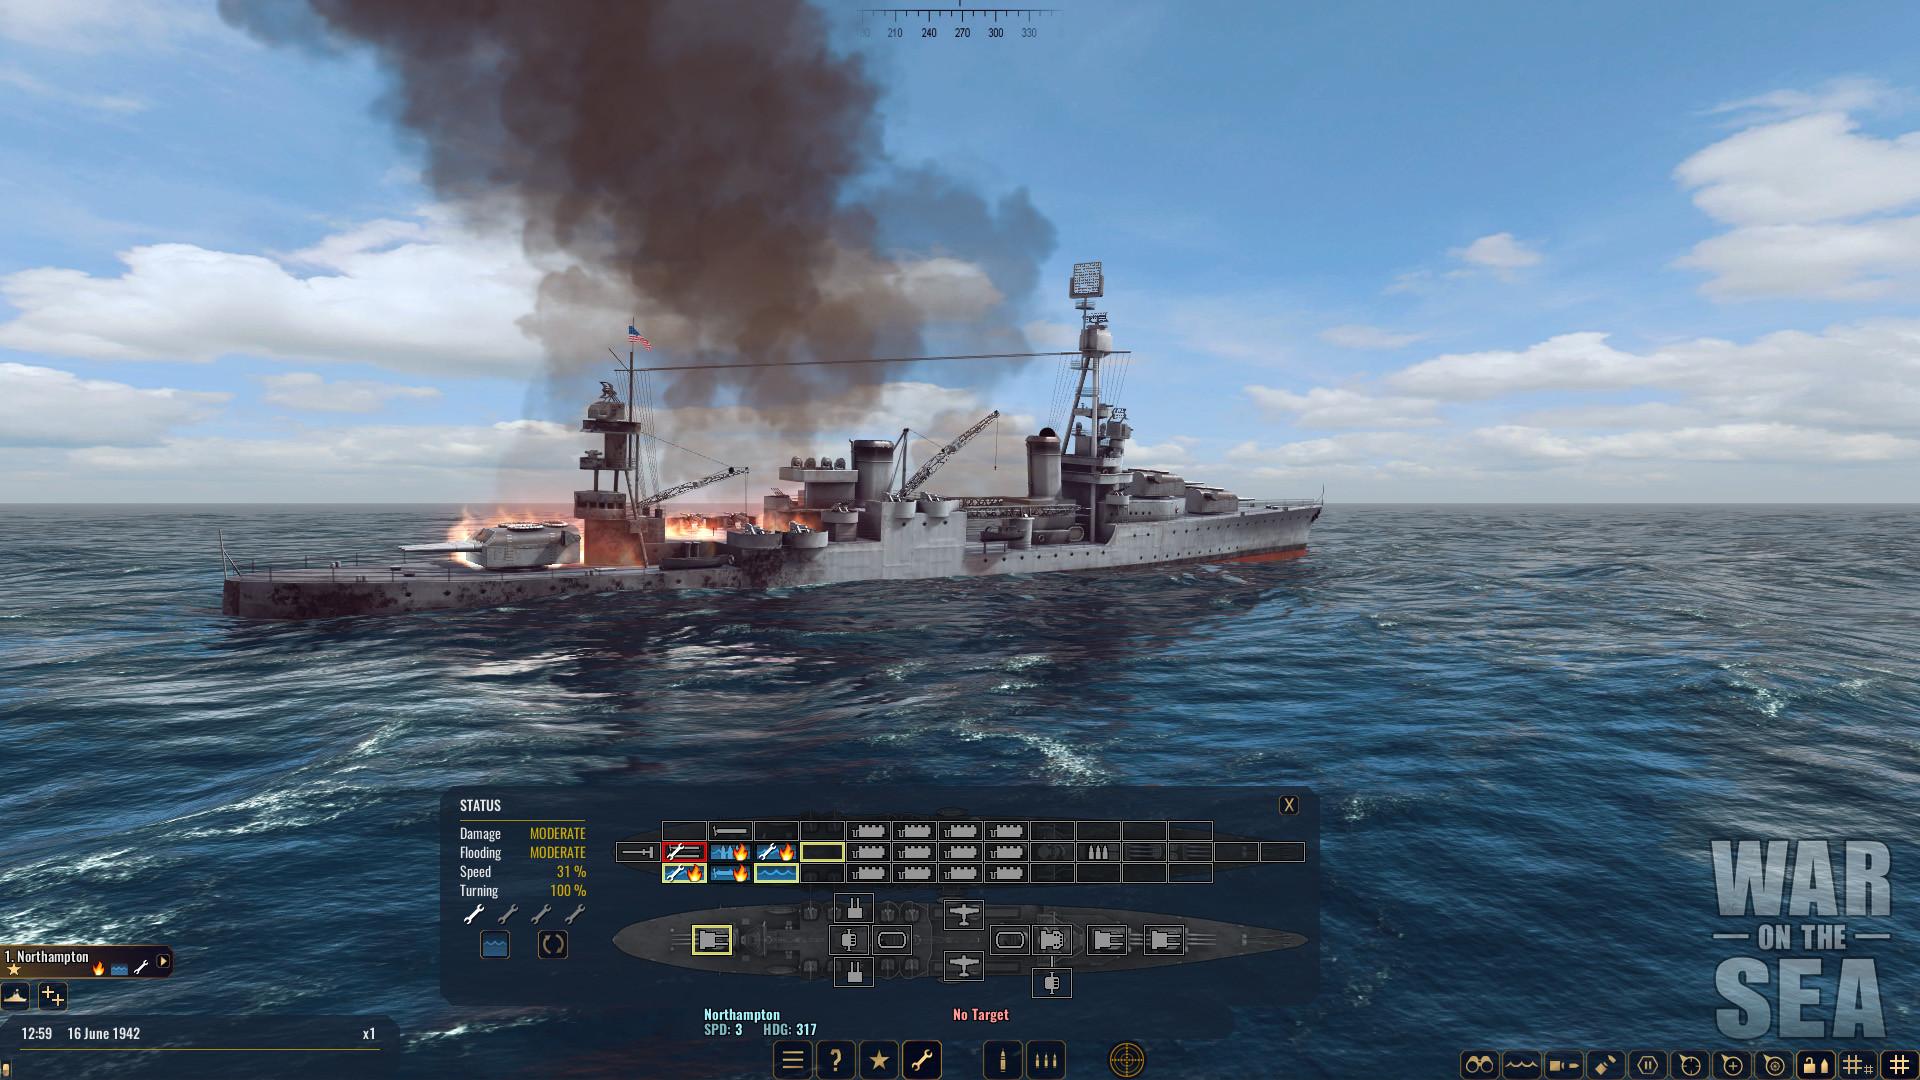 war-on-the-sea-pc-screenshot-02